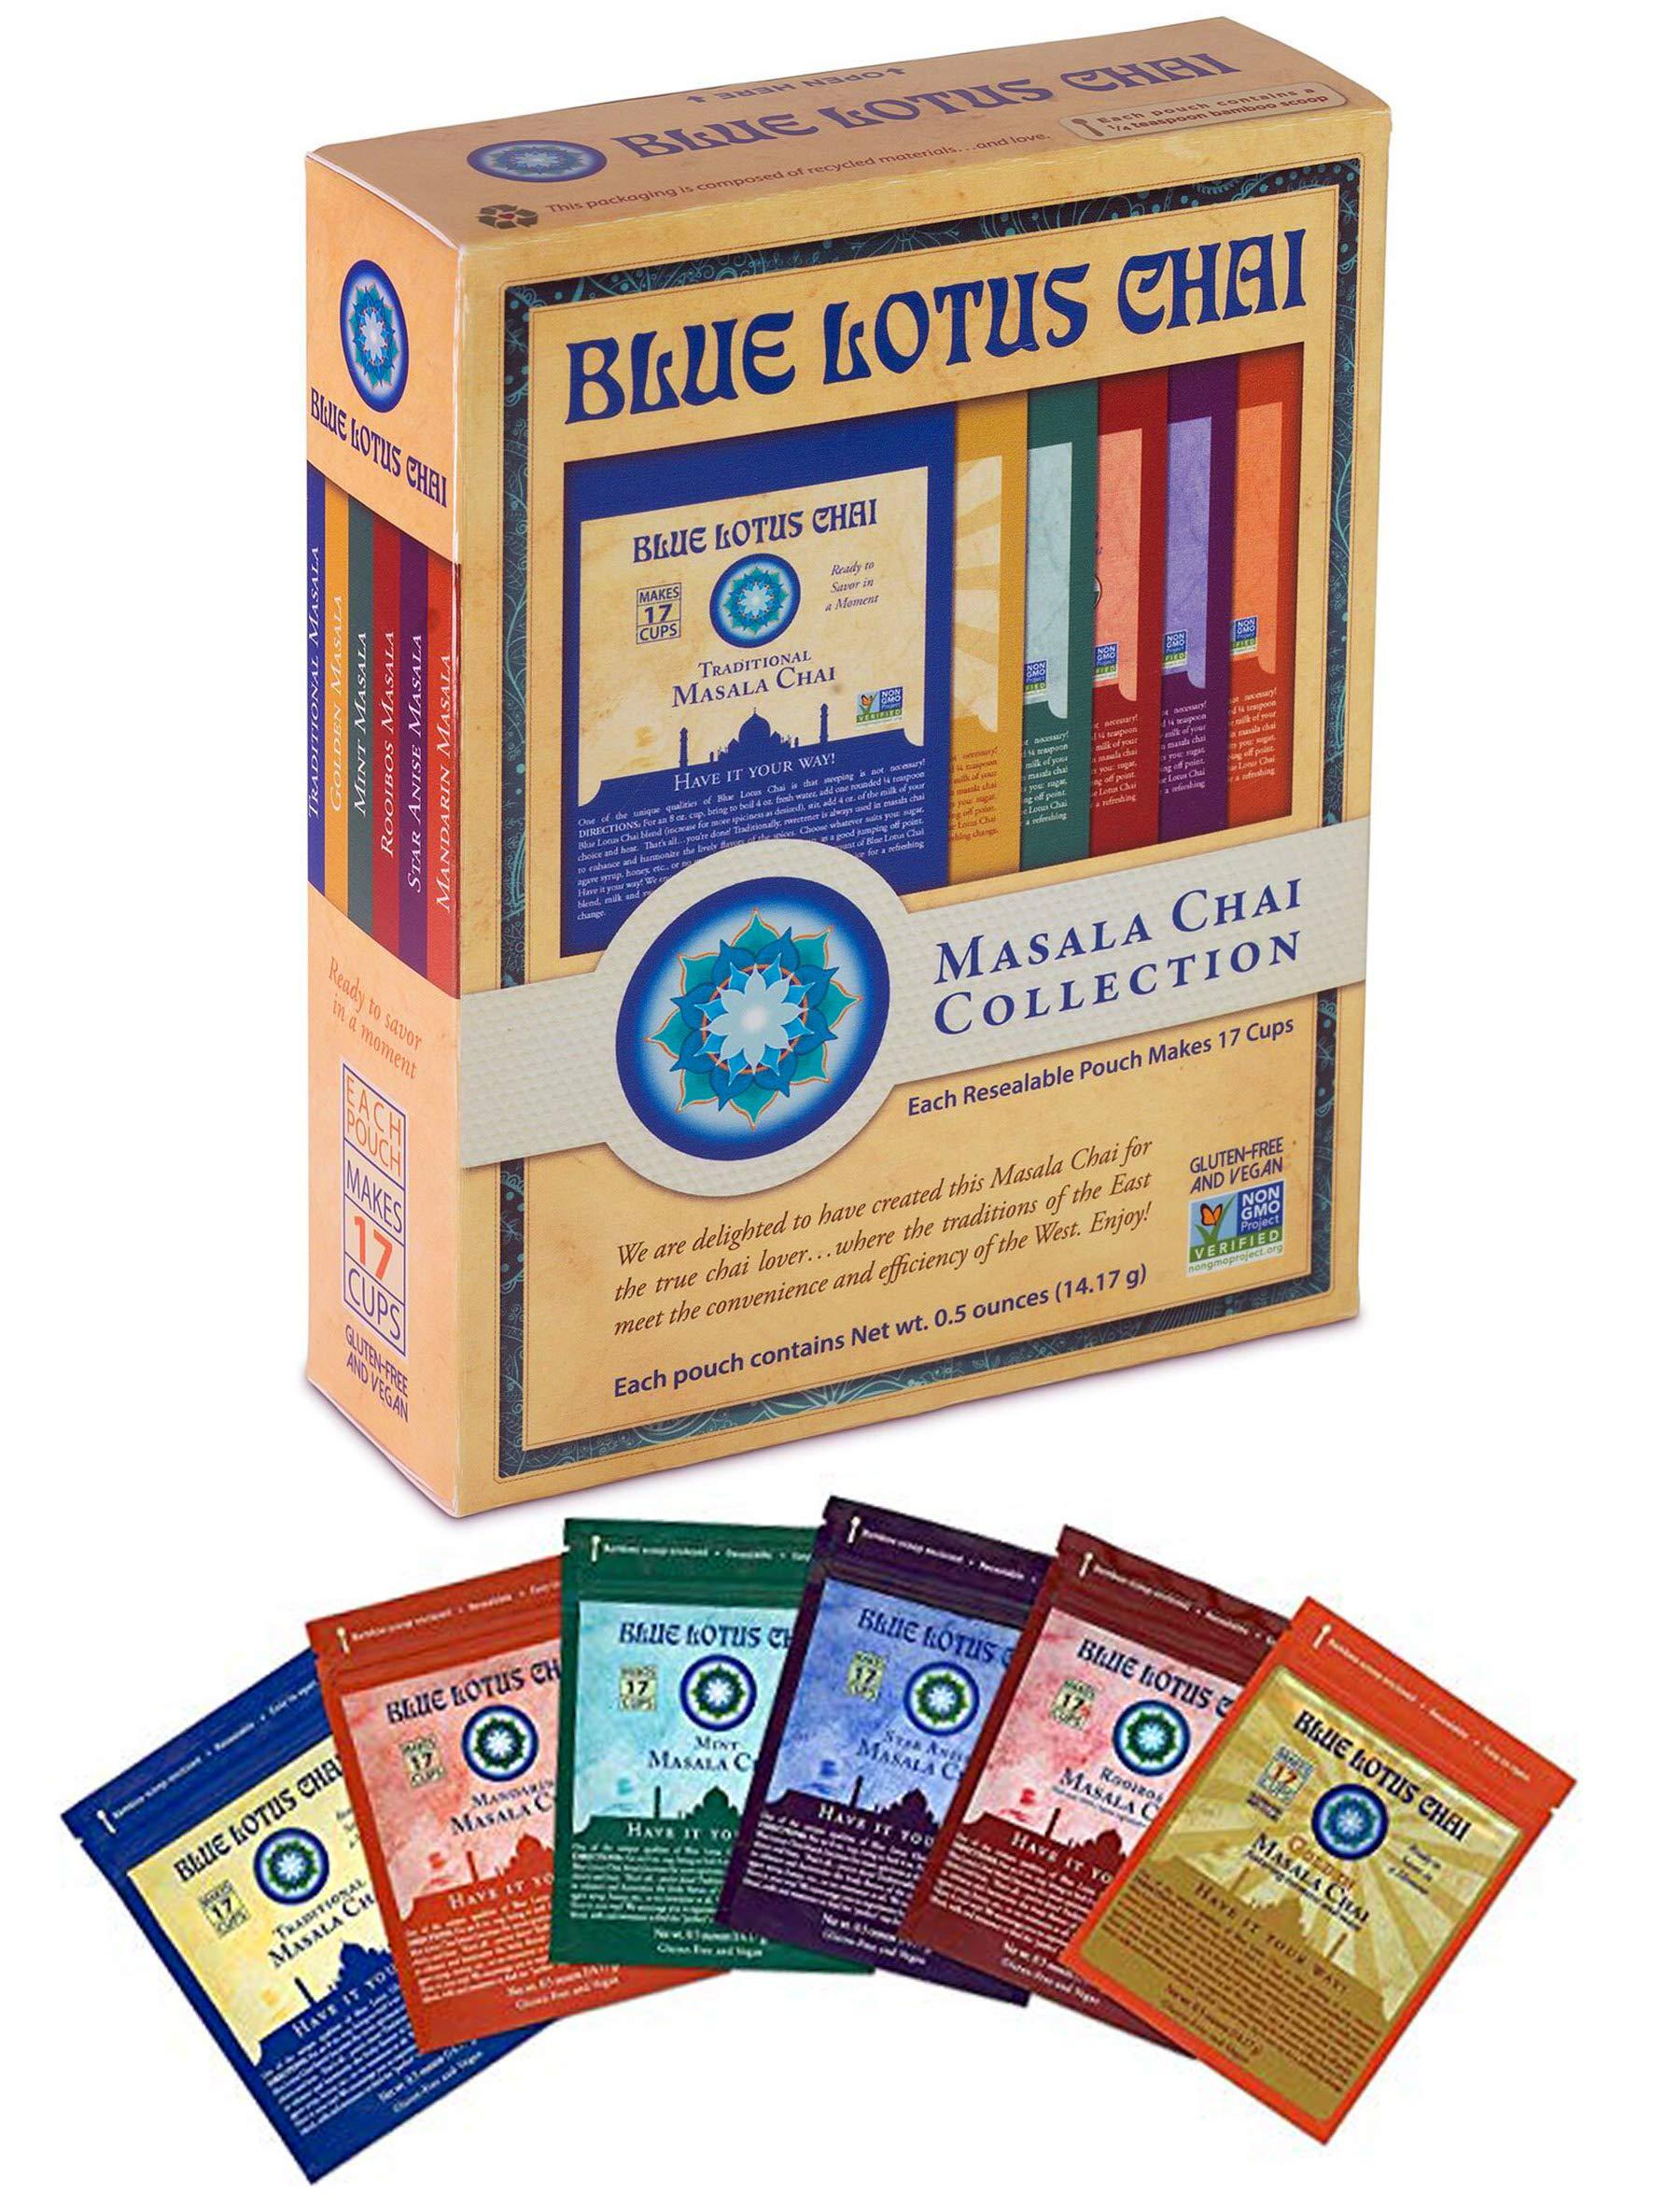 Blue Lotus Chai - Masala Chai Collection - Six Varieties - 0.5 oz each (14.17g)